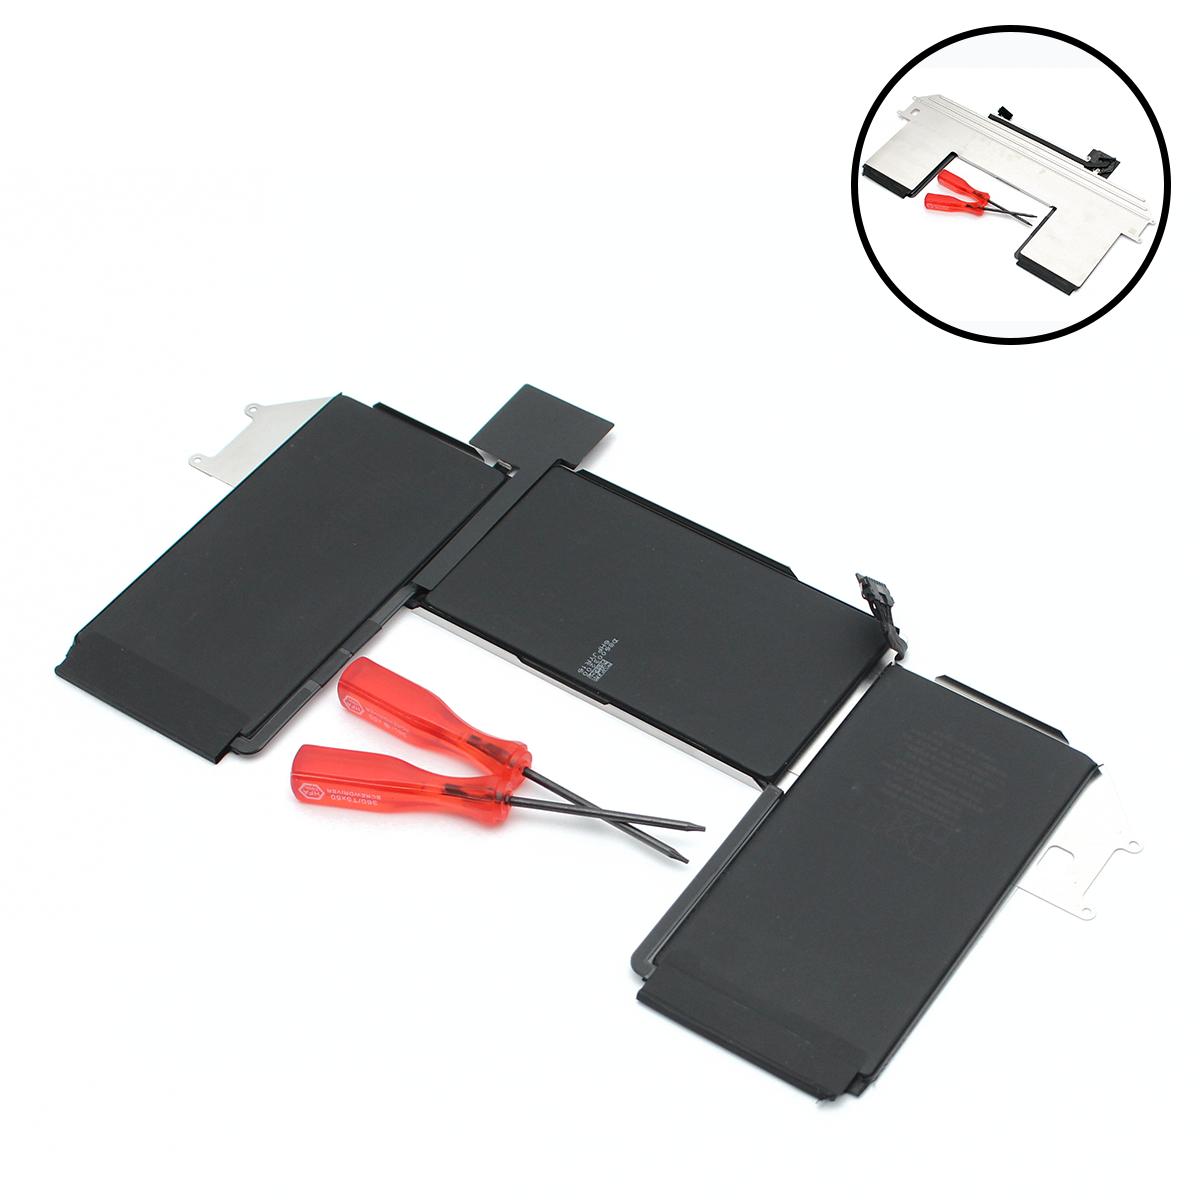 "Батарея, аккумулятор для MacBook Air 13"" 2020 M1 Chip (A2337)"